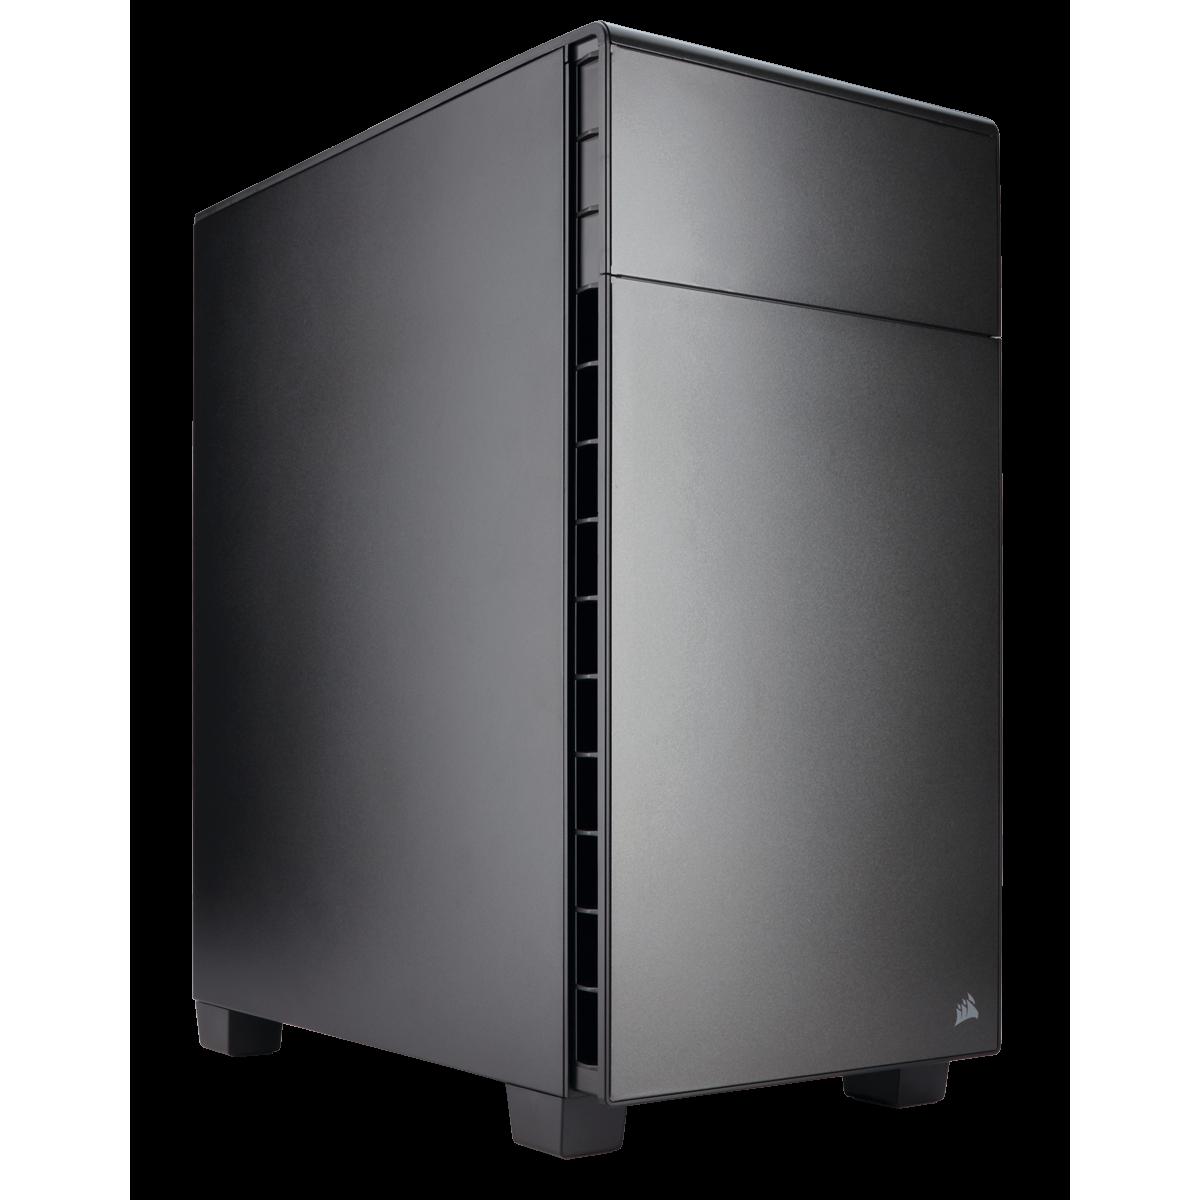 Gabinete Gamer Corsair Carbide Quiet 600Q Inverse, Full Tower, Com 3 Fans, Black, S-Fonte, CC-9011080-WW